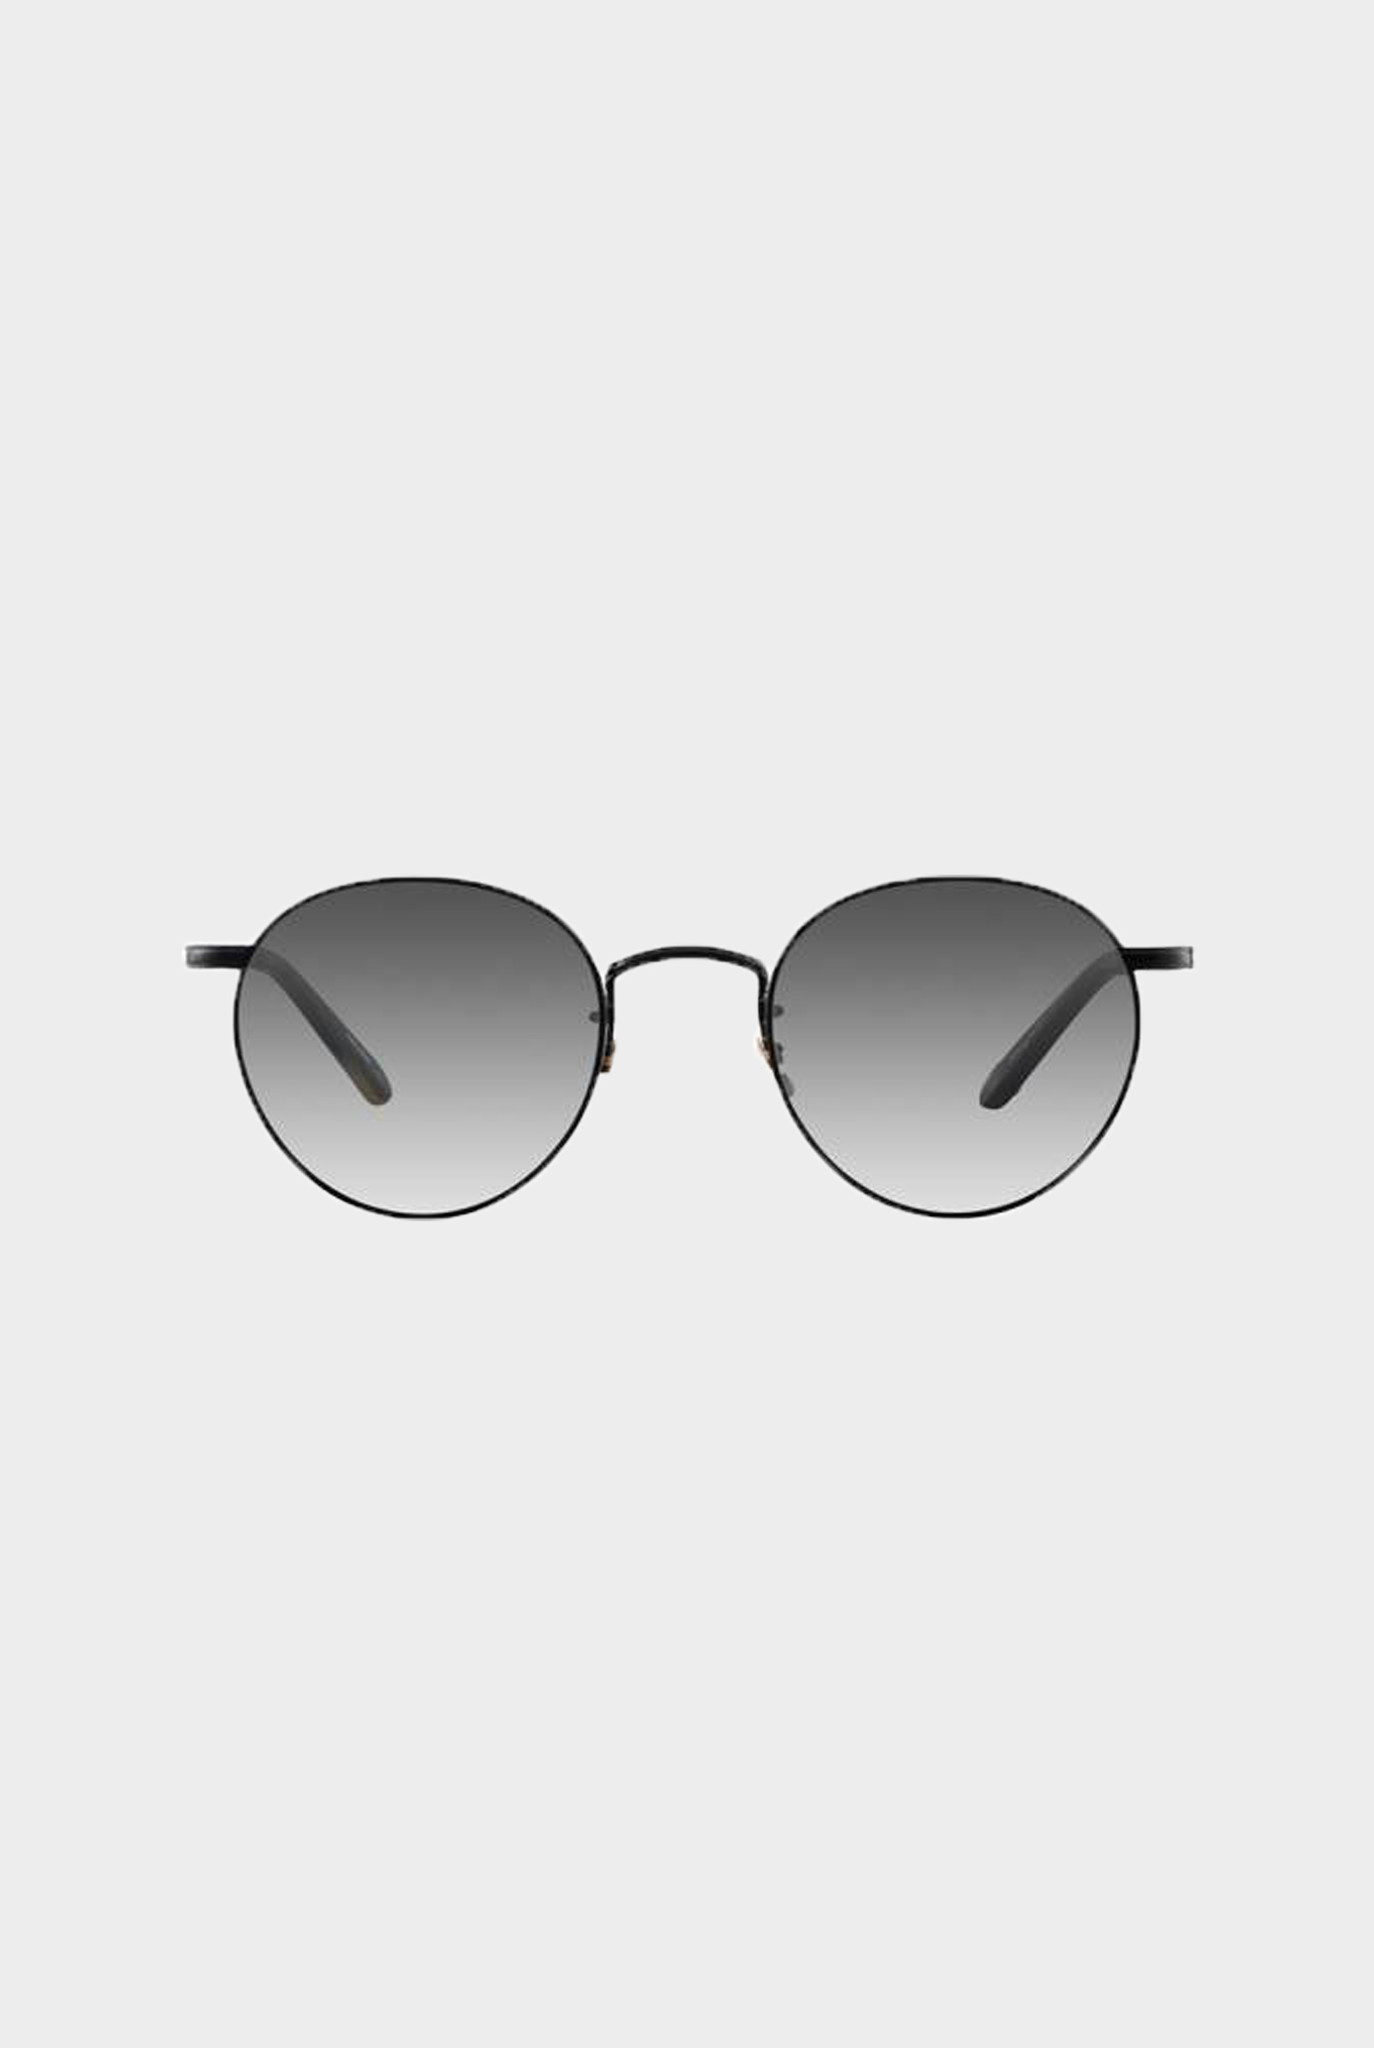 Wilson M sunglasses Black/Semi-Flat Grey Gradient